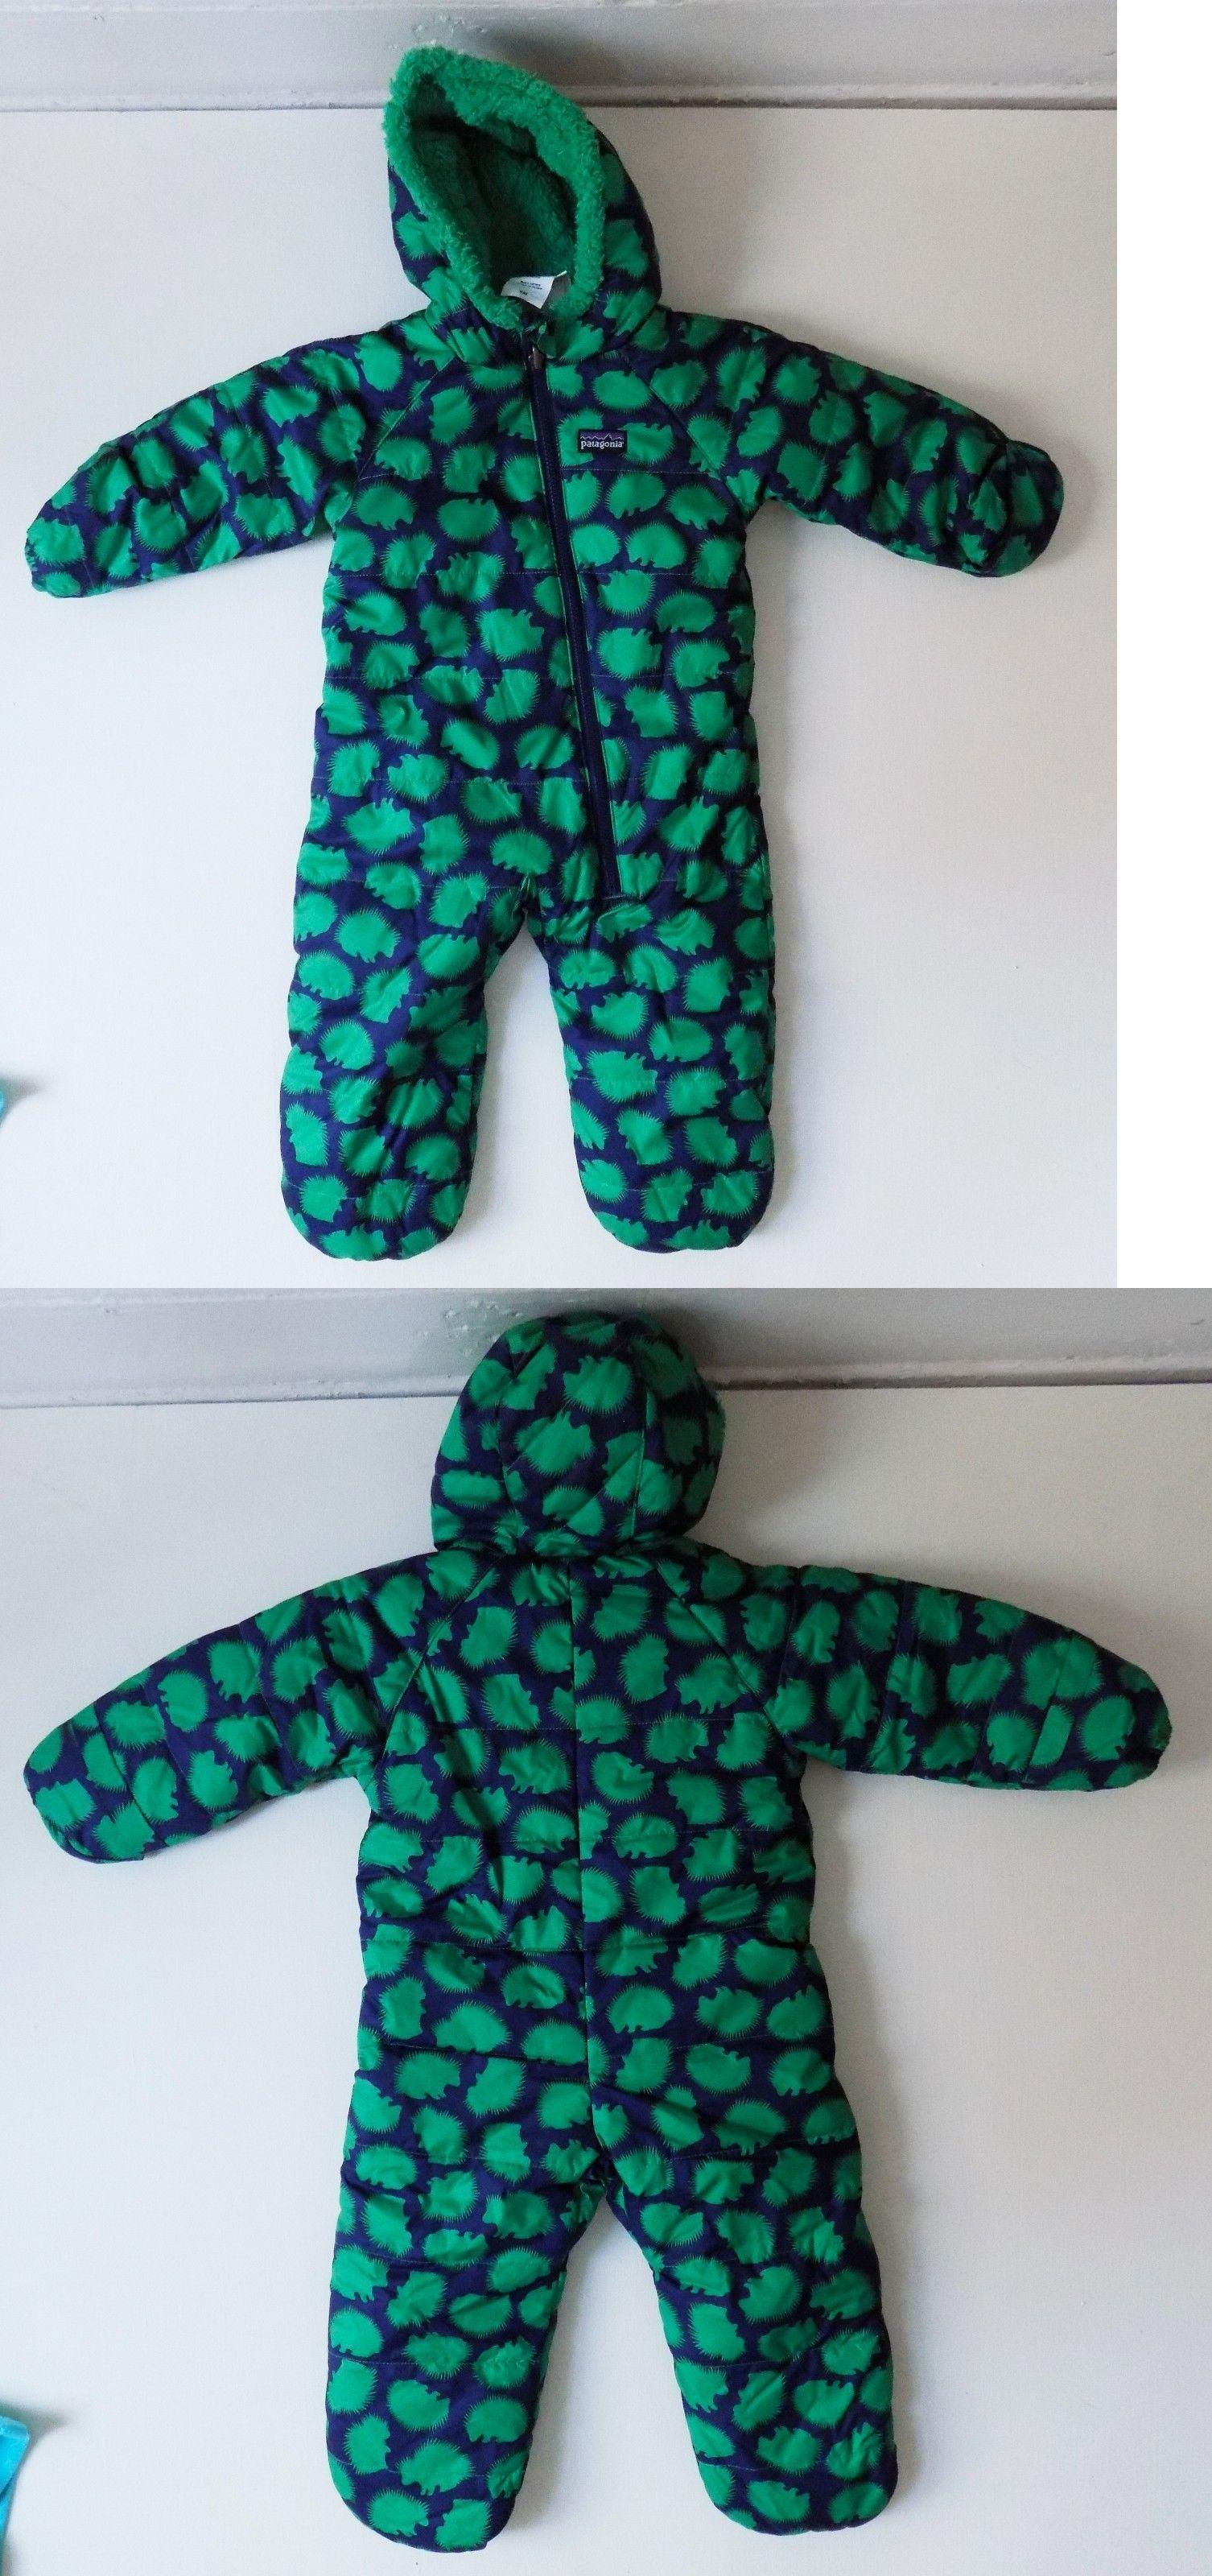 6efba1336eec Outerwear 163399  Patagonia Baby Snowsuit Fleece Bunting 6 Months ...